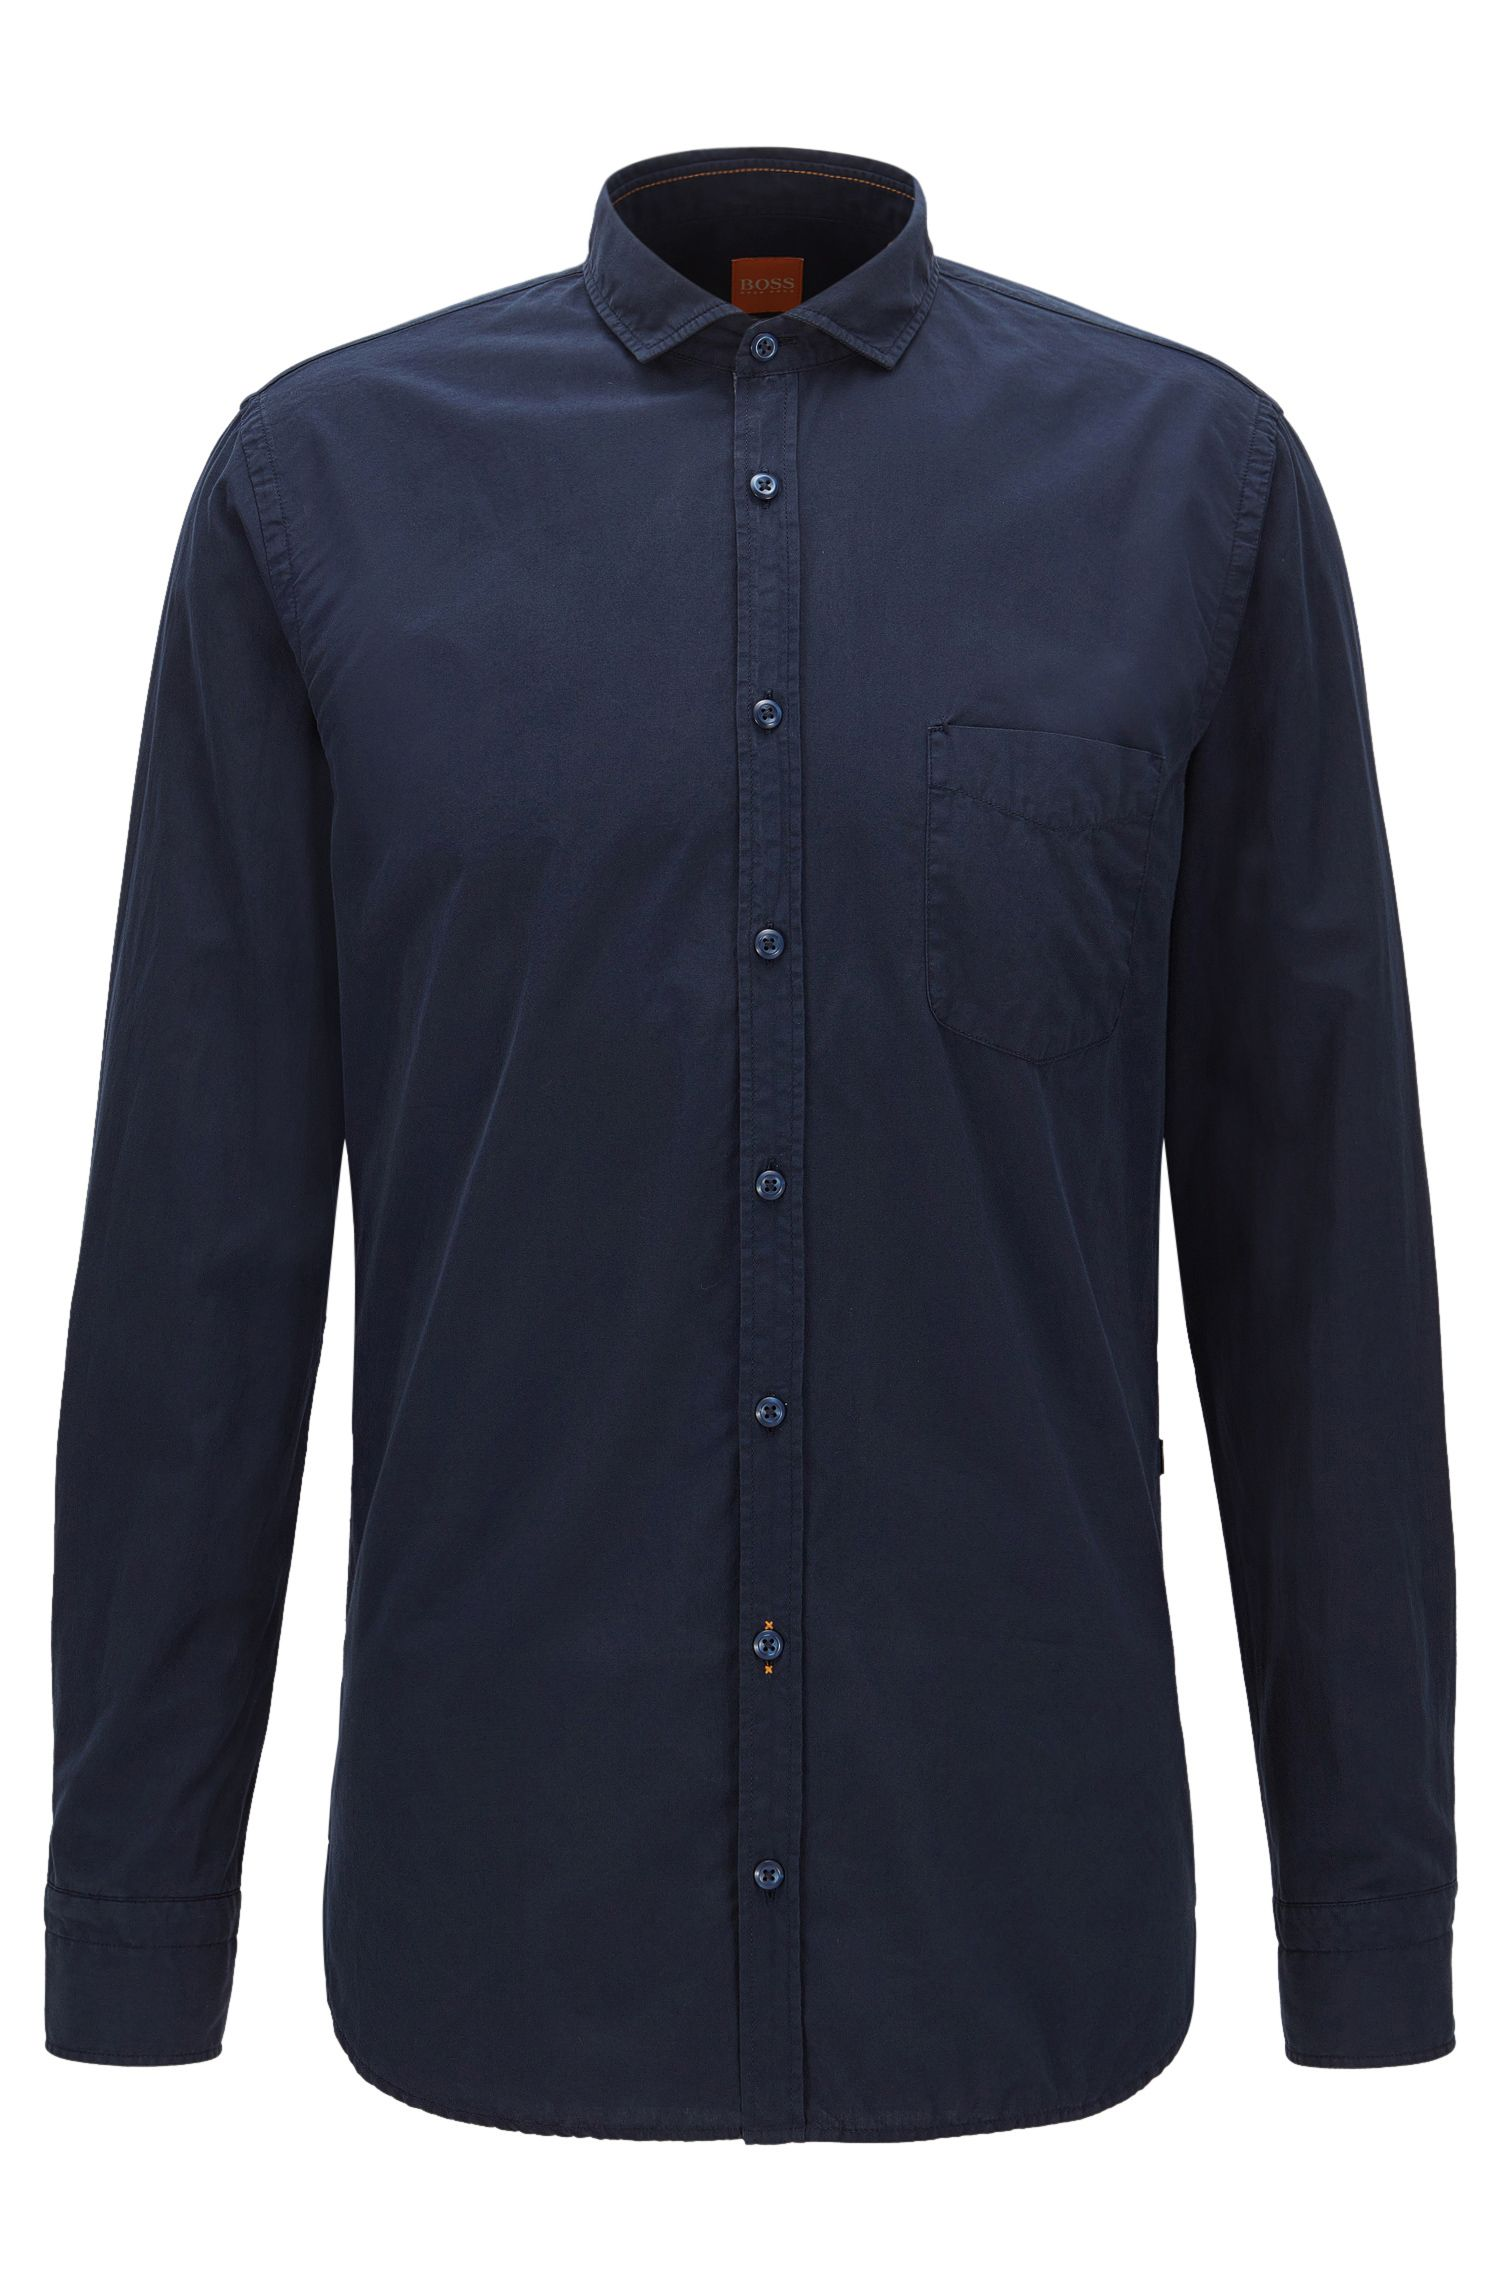 'Cattitude Short' | Slim Fit, Cotton Poplin Button Down Shirt